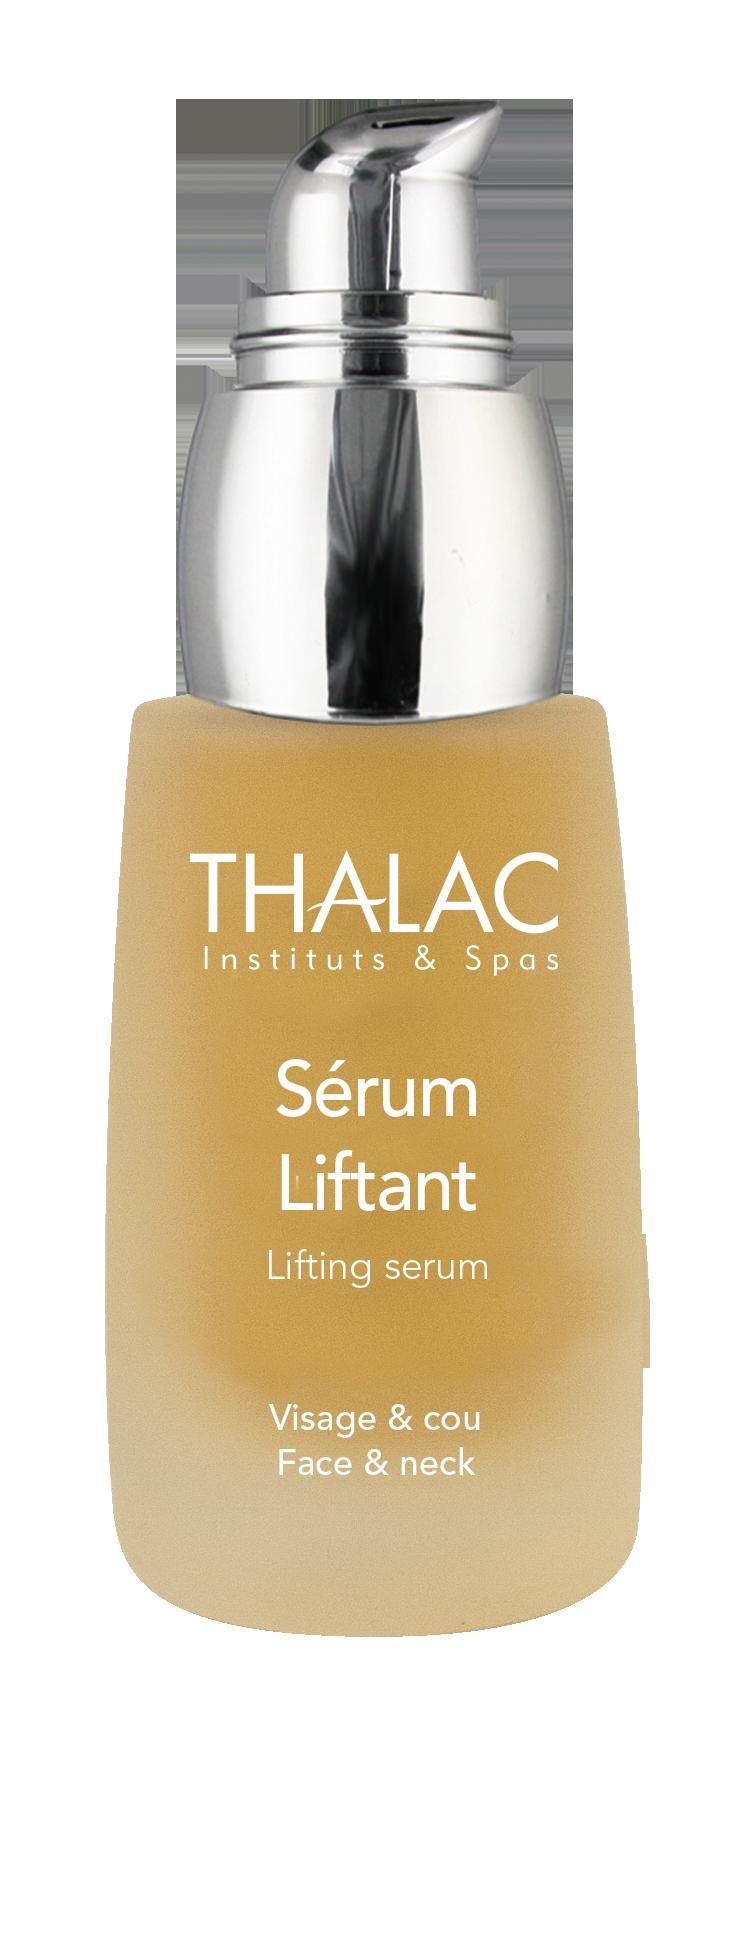 Serum Liftant